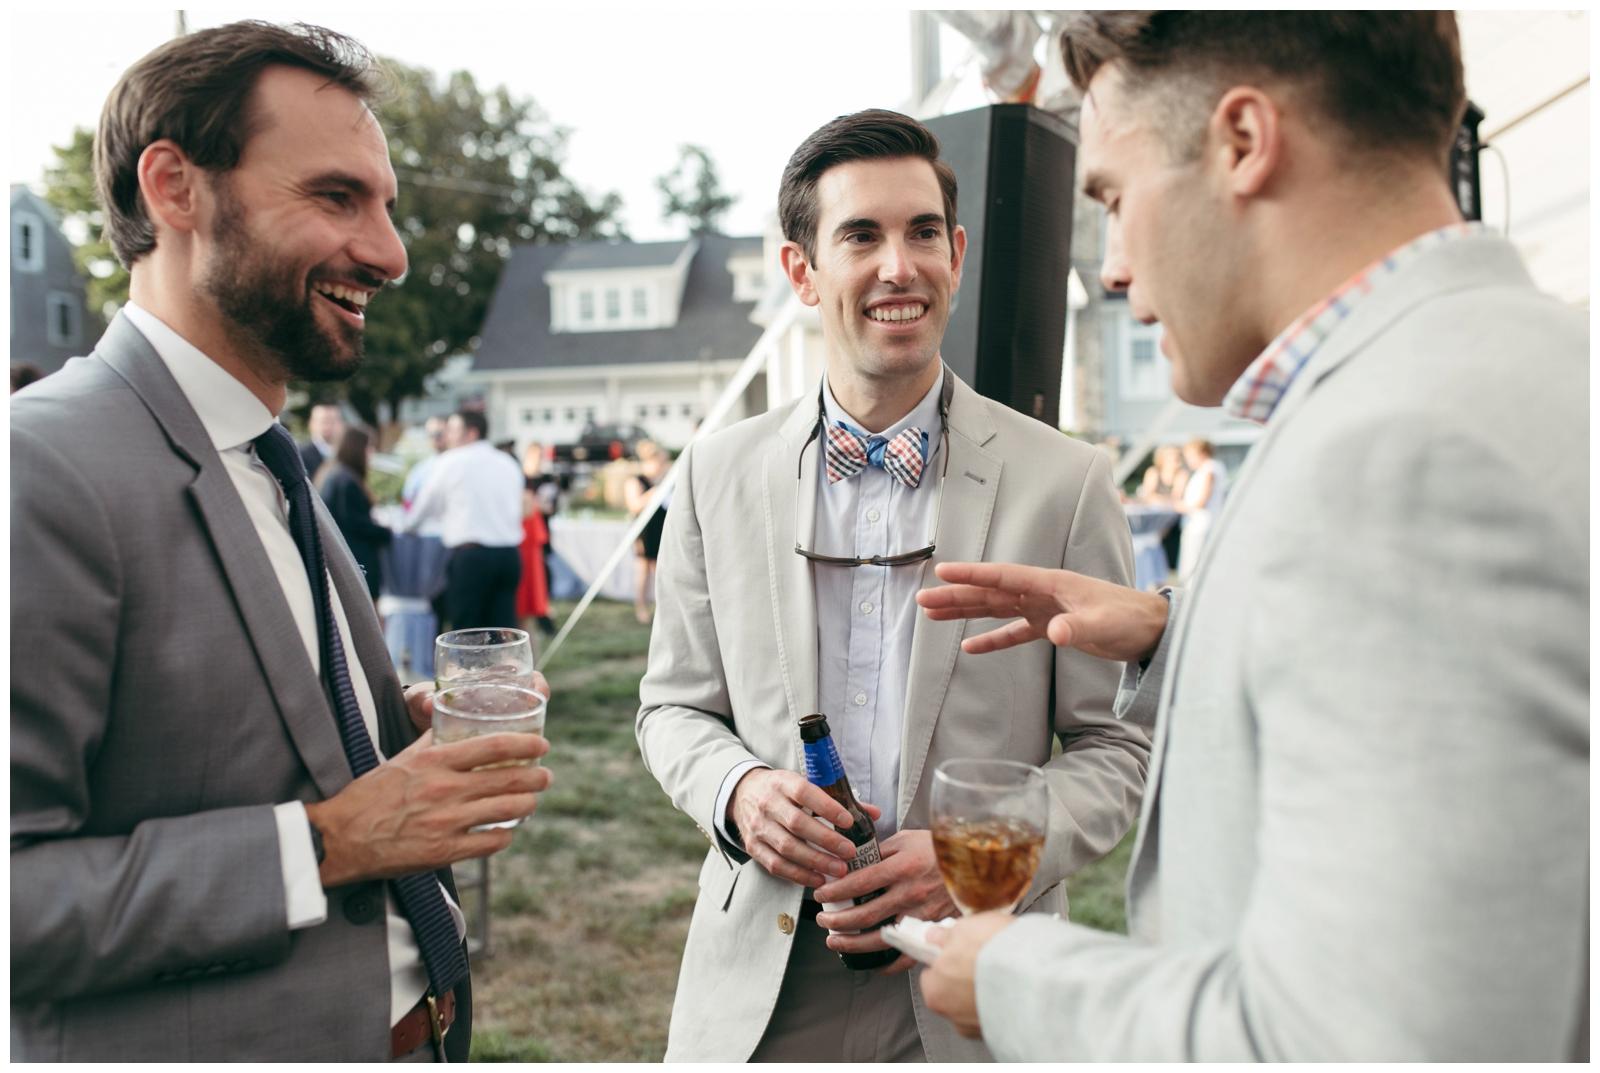 Bailey-Q-Photo-Backyard-Wedding-South-Shore-Boston-Wedding-Photographer-080.jpg